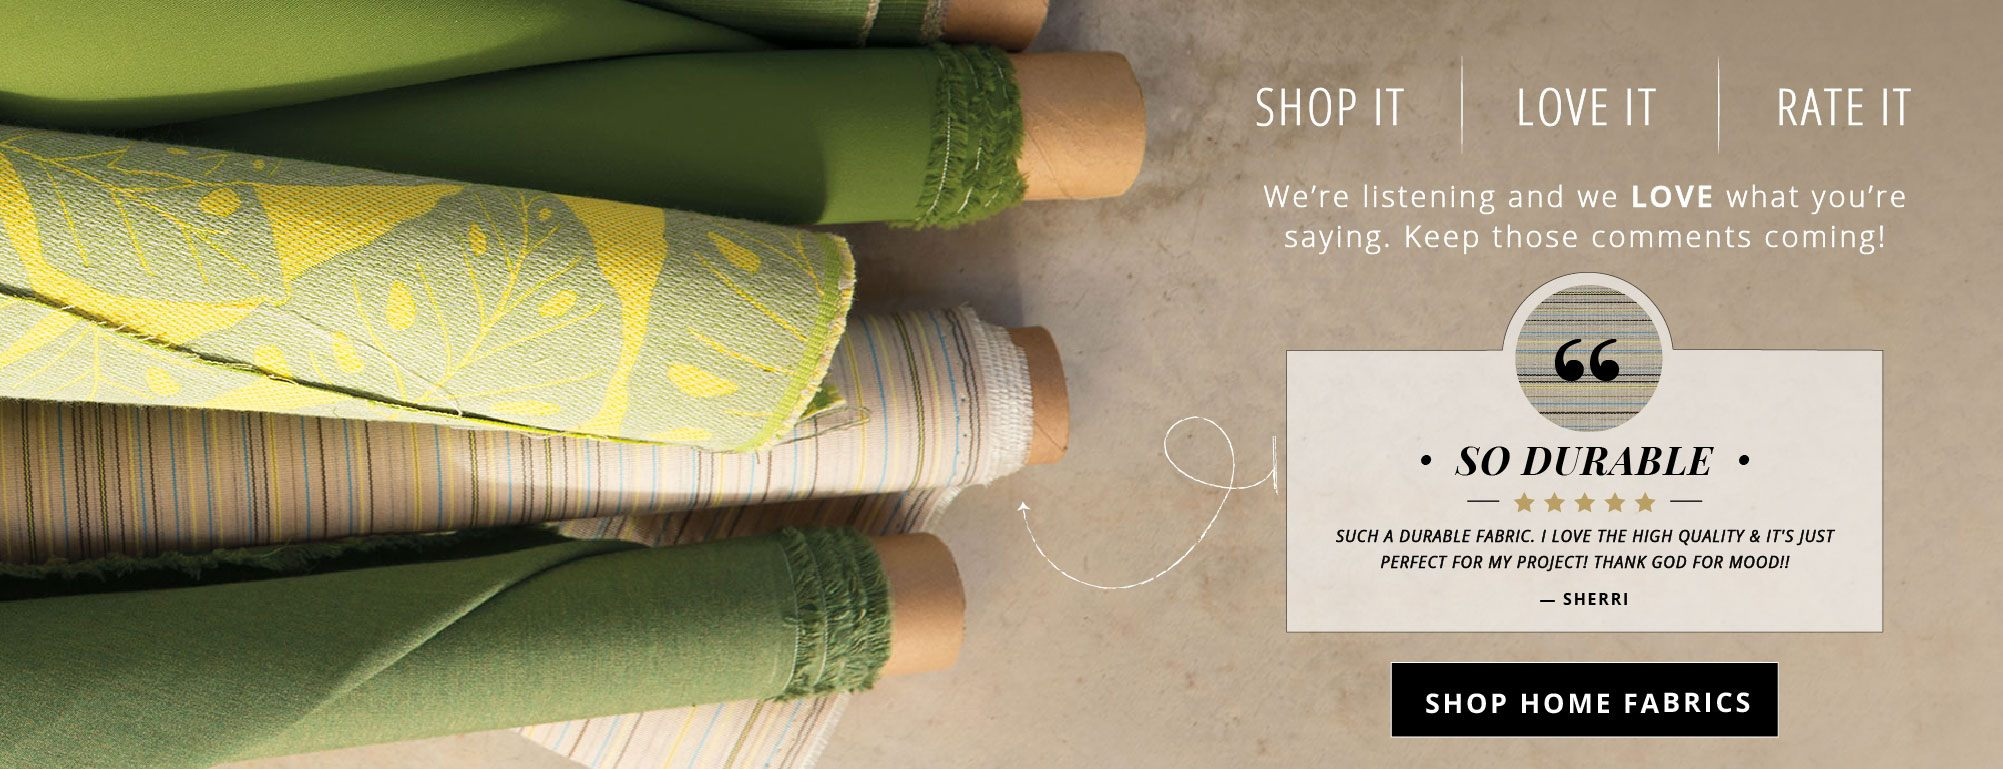 Shop Our Ever Expanding Home Fabrics Section